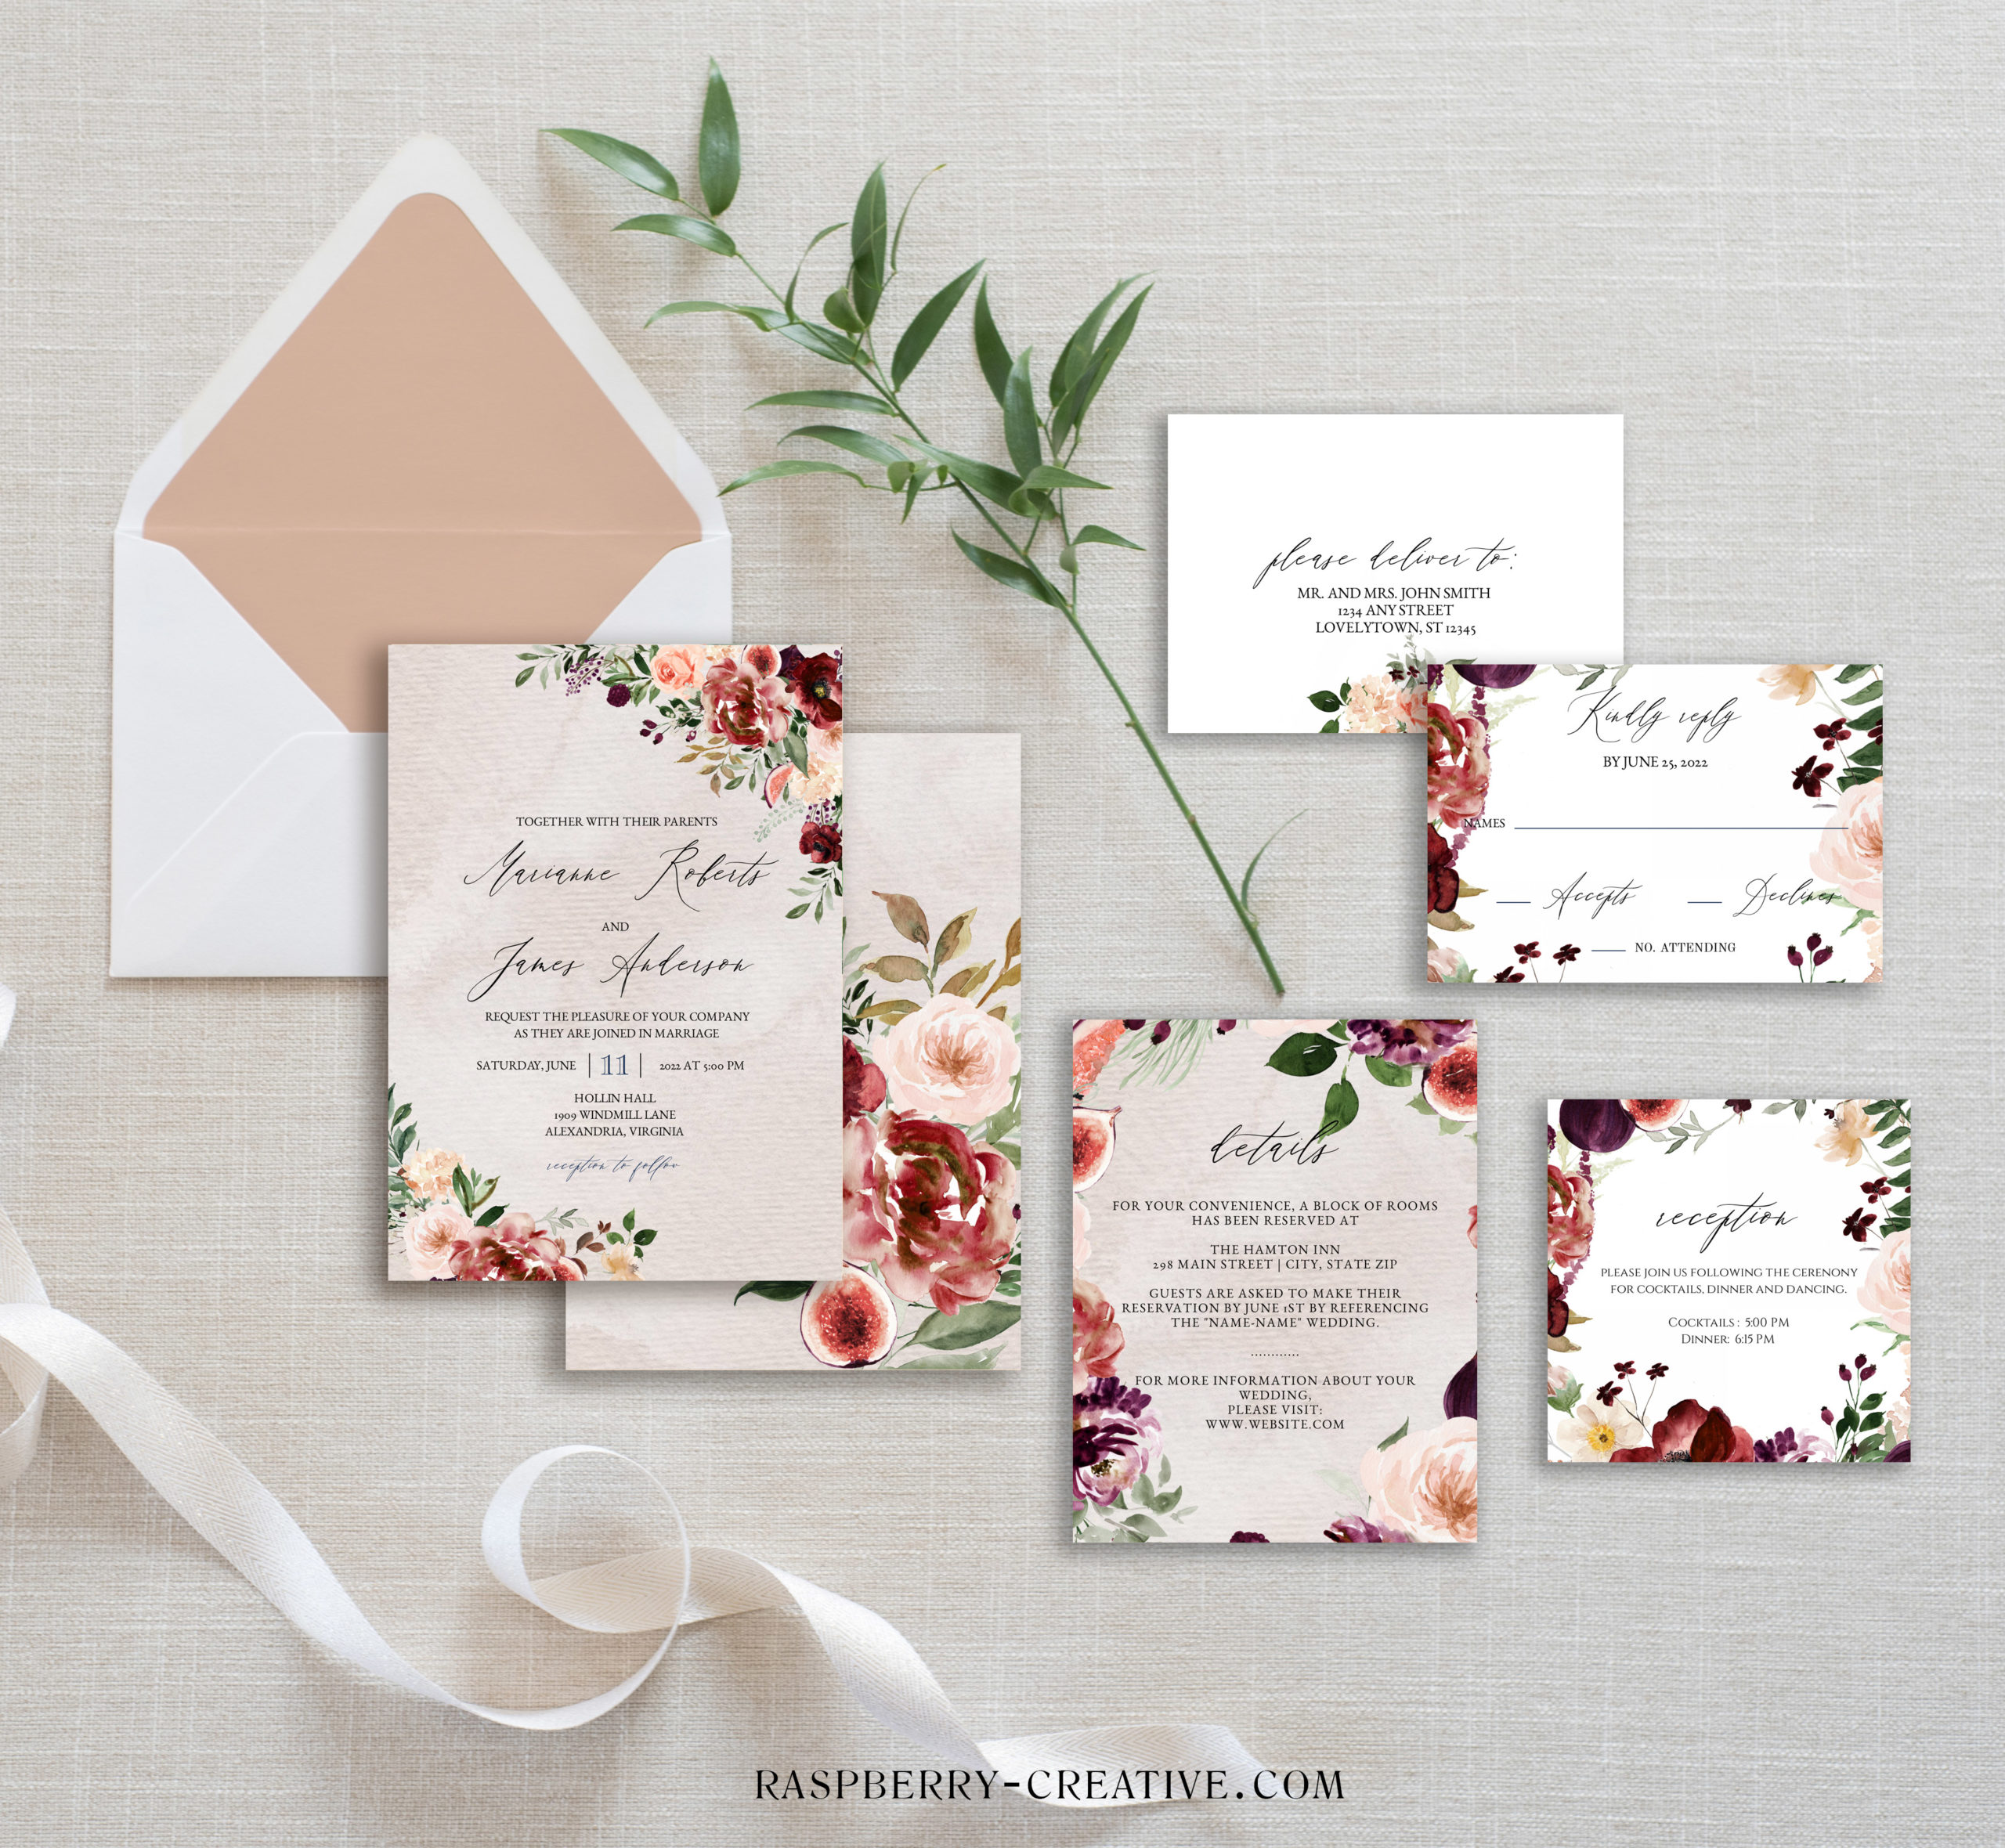 autumn-shrine-wedding-invitation-template-1